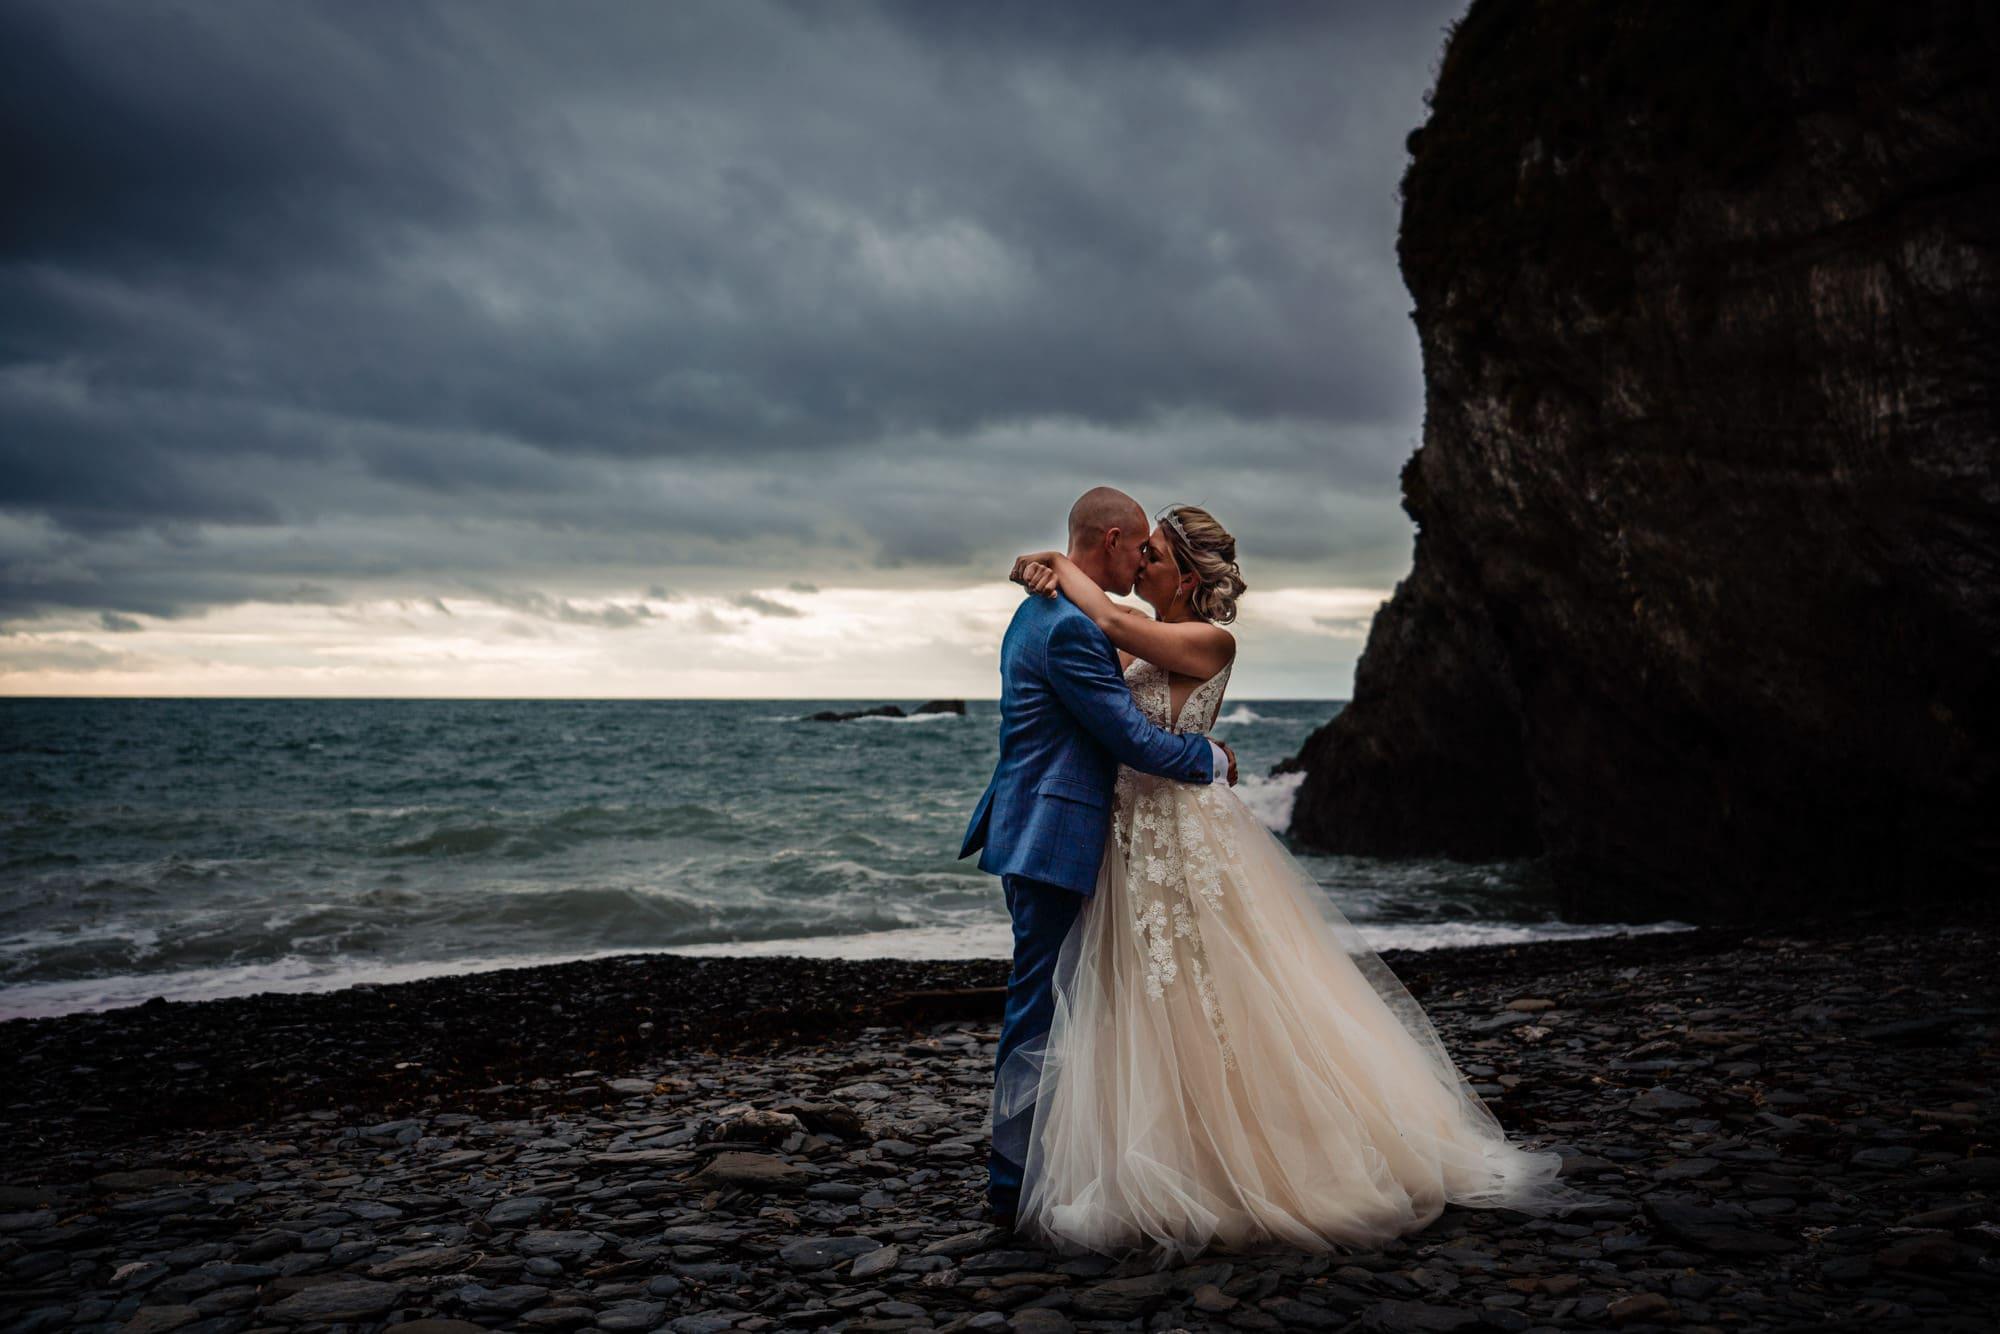 Elopement Wedding Photography in Devon – My favourite coastal locations